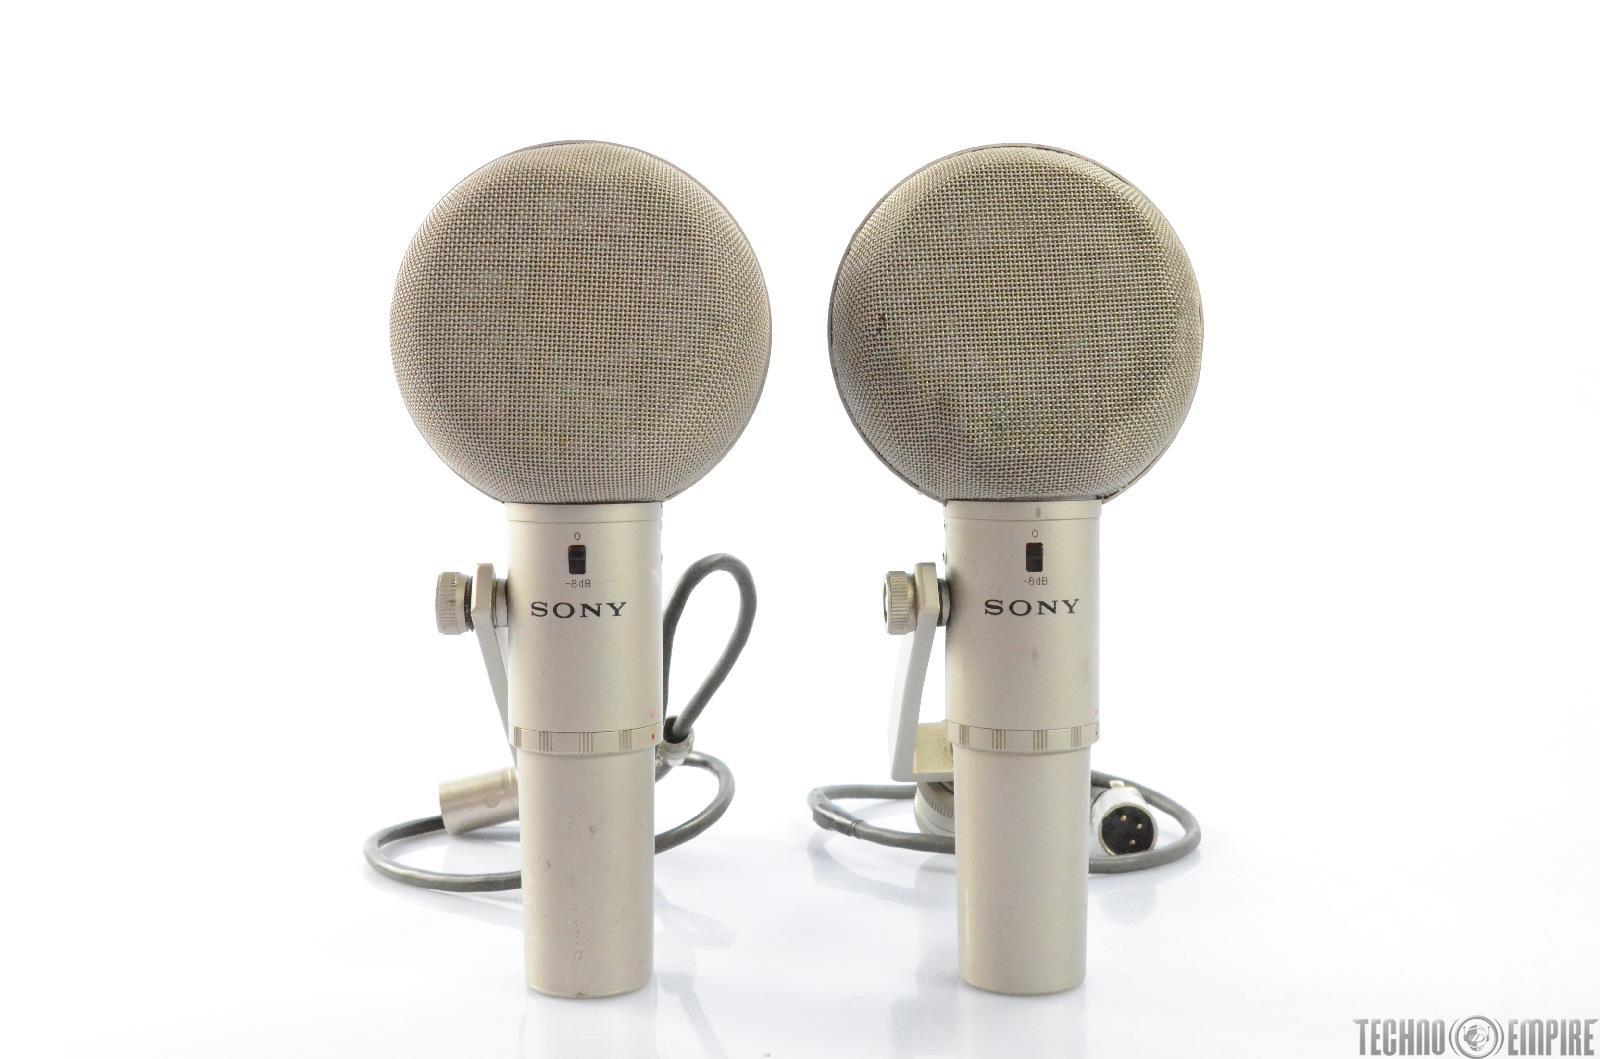 2 Sony C-500 Studio Condenser Microphones w/ Power Grandmaster Recorders #28766